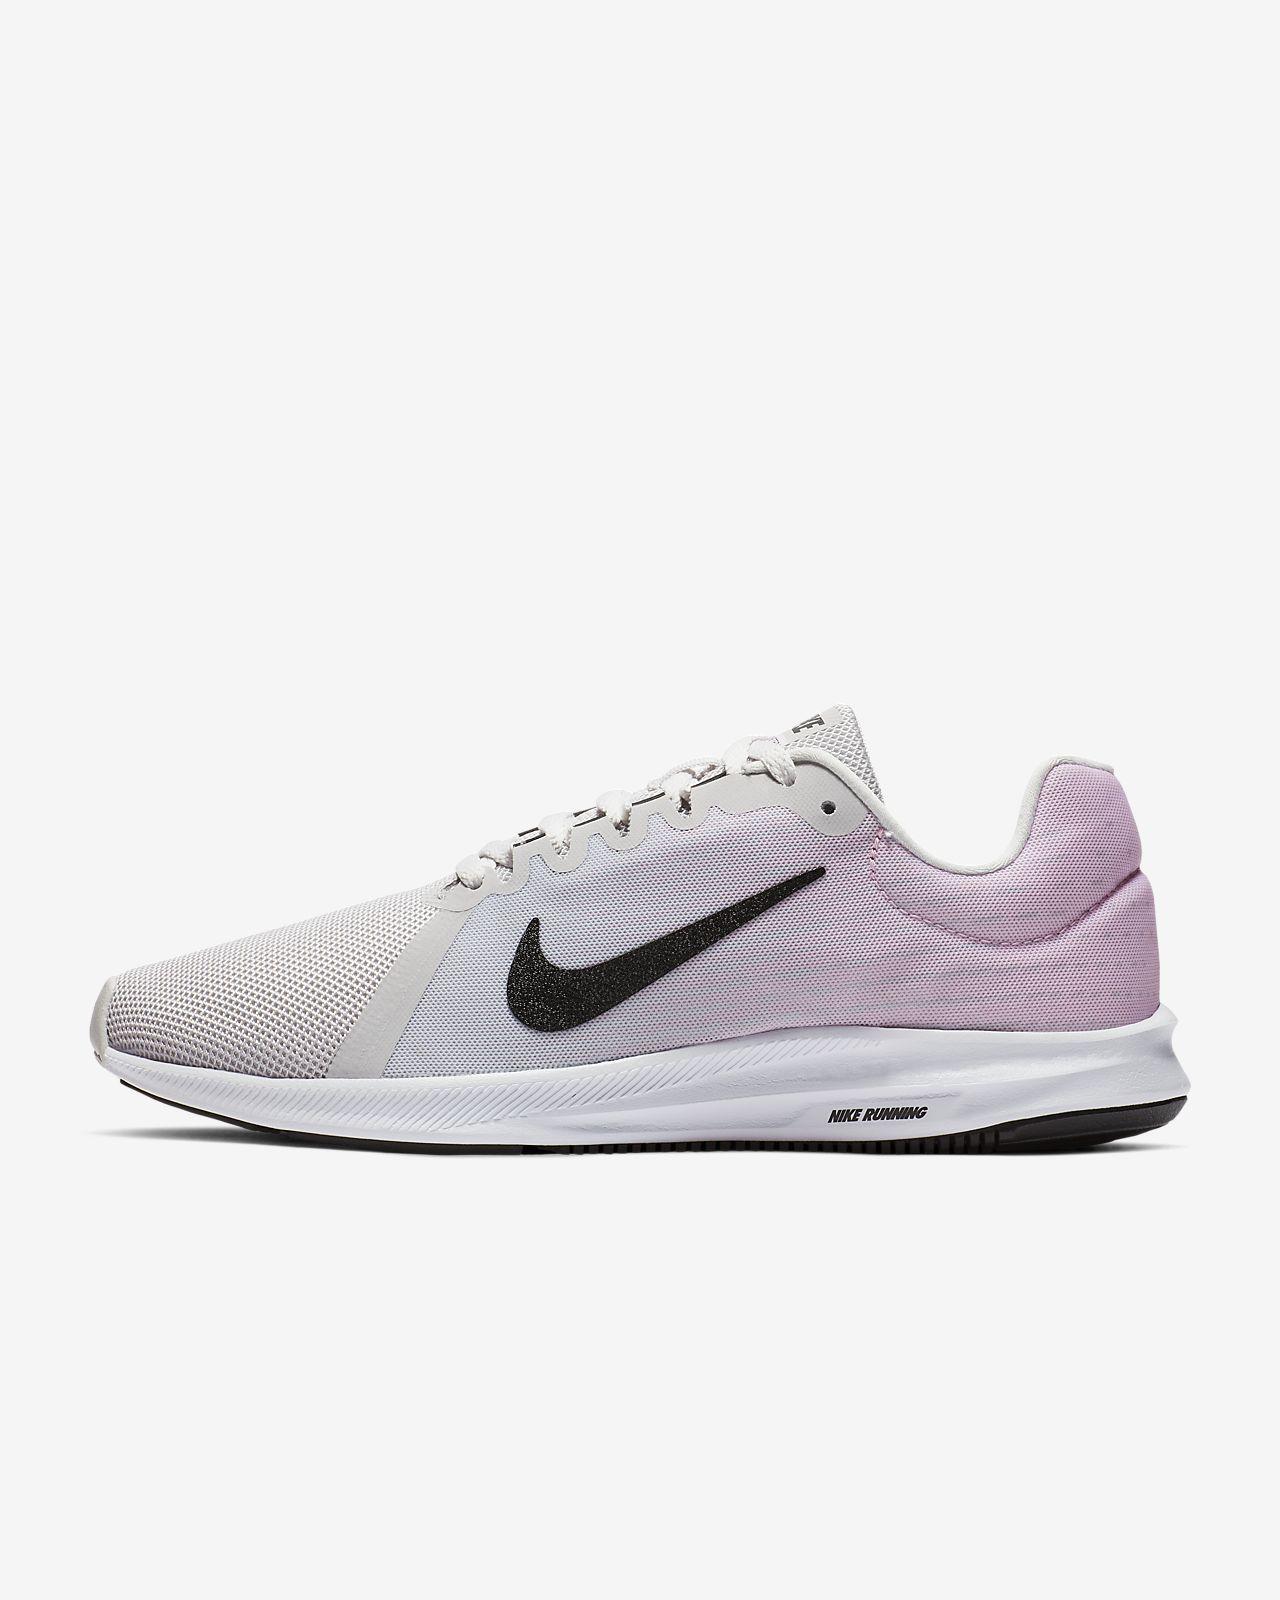 6b0b94d2576f3 Nike Downshifter 8 Zapatillas de running - Mujer. Nike.com ES